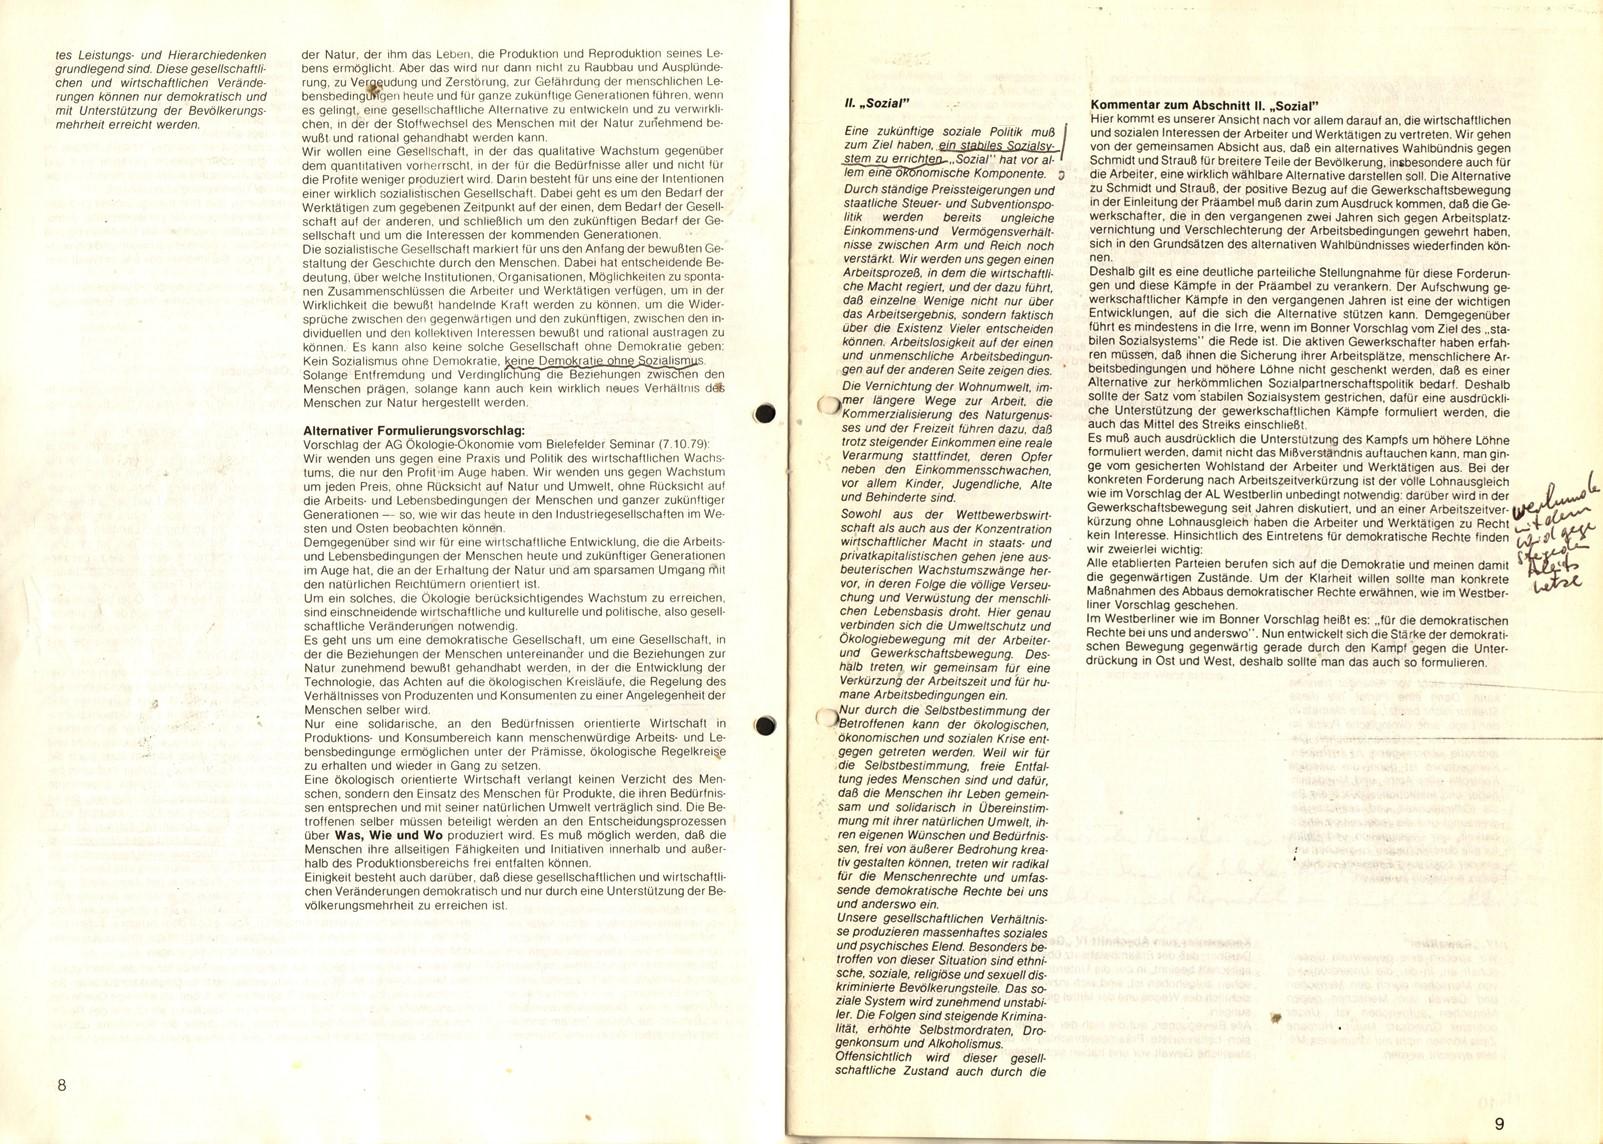 KPDAO_1979_Diskussion_Bundestagswahlen_1980_05